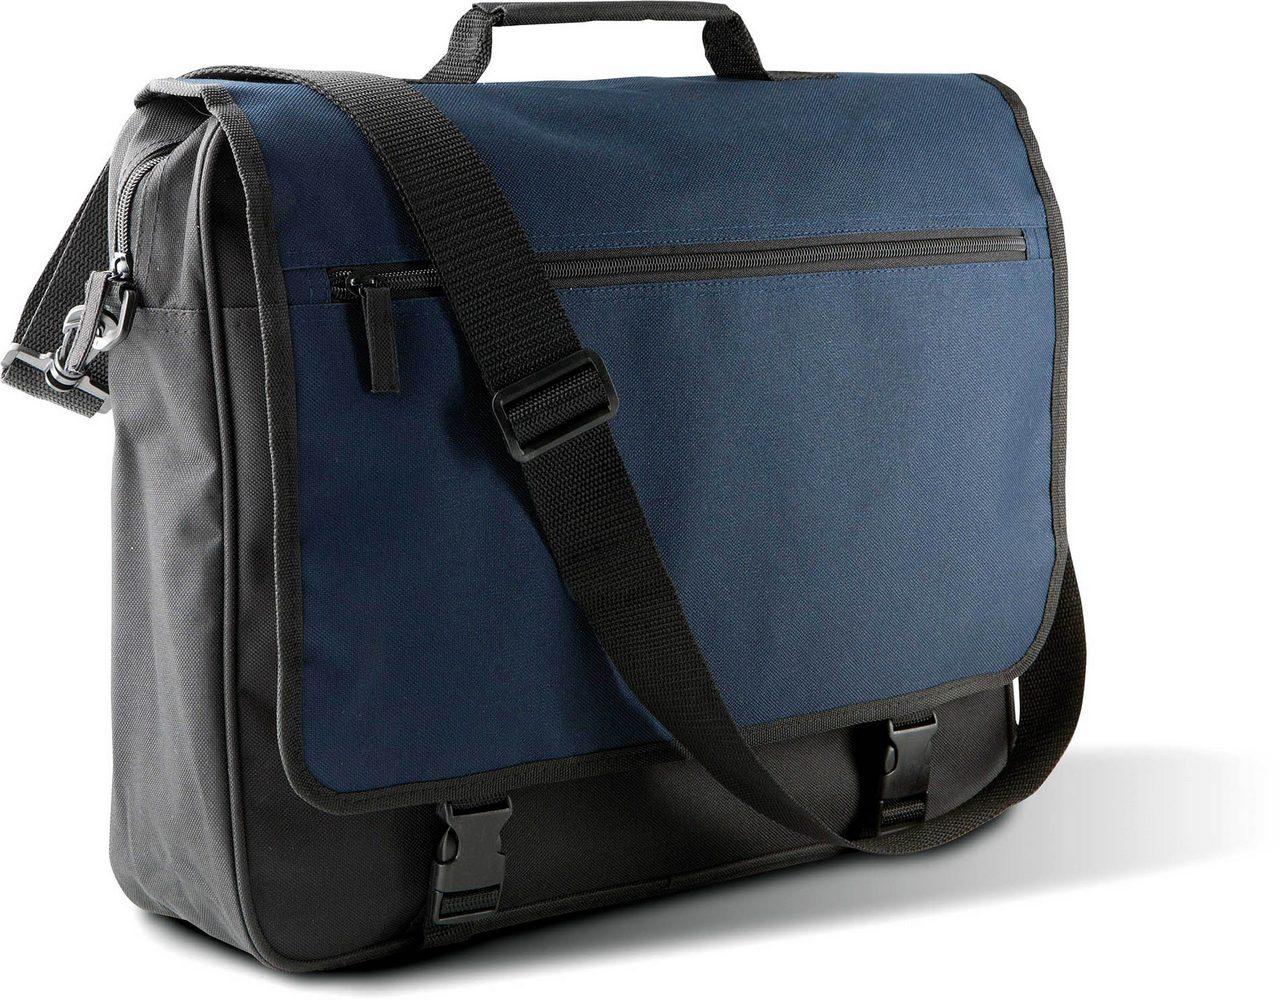 Geanta KI0412 negru bleumarin lime Genti rucsacuri personalizate conferinta laptop sport compartiment serigrafie broderie termotransfer